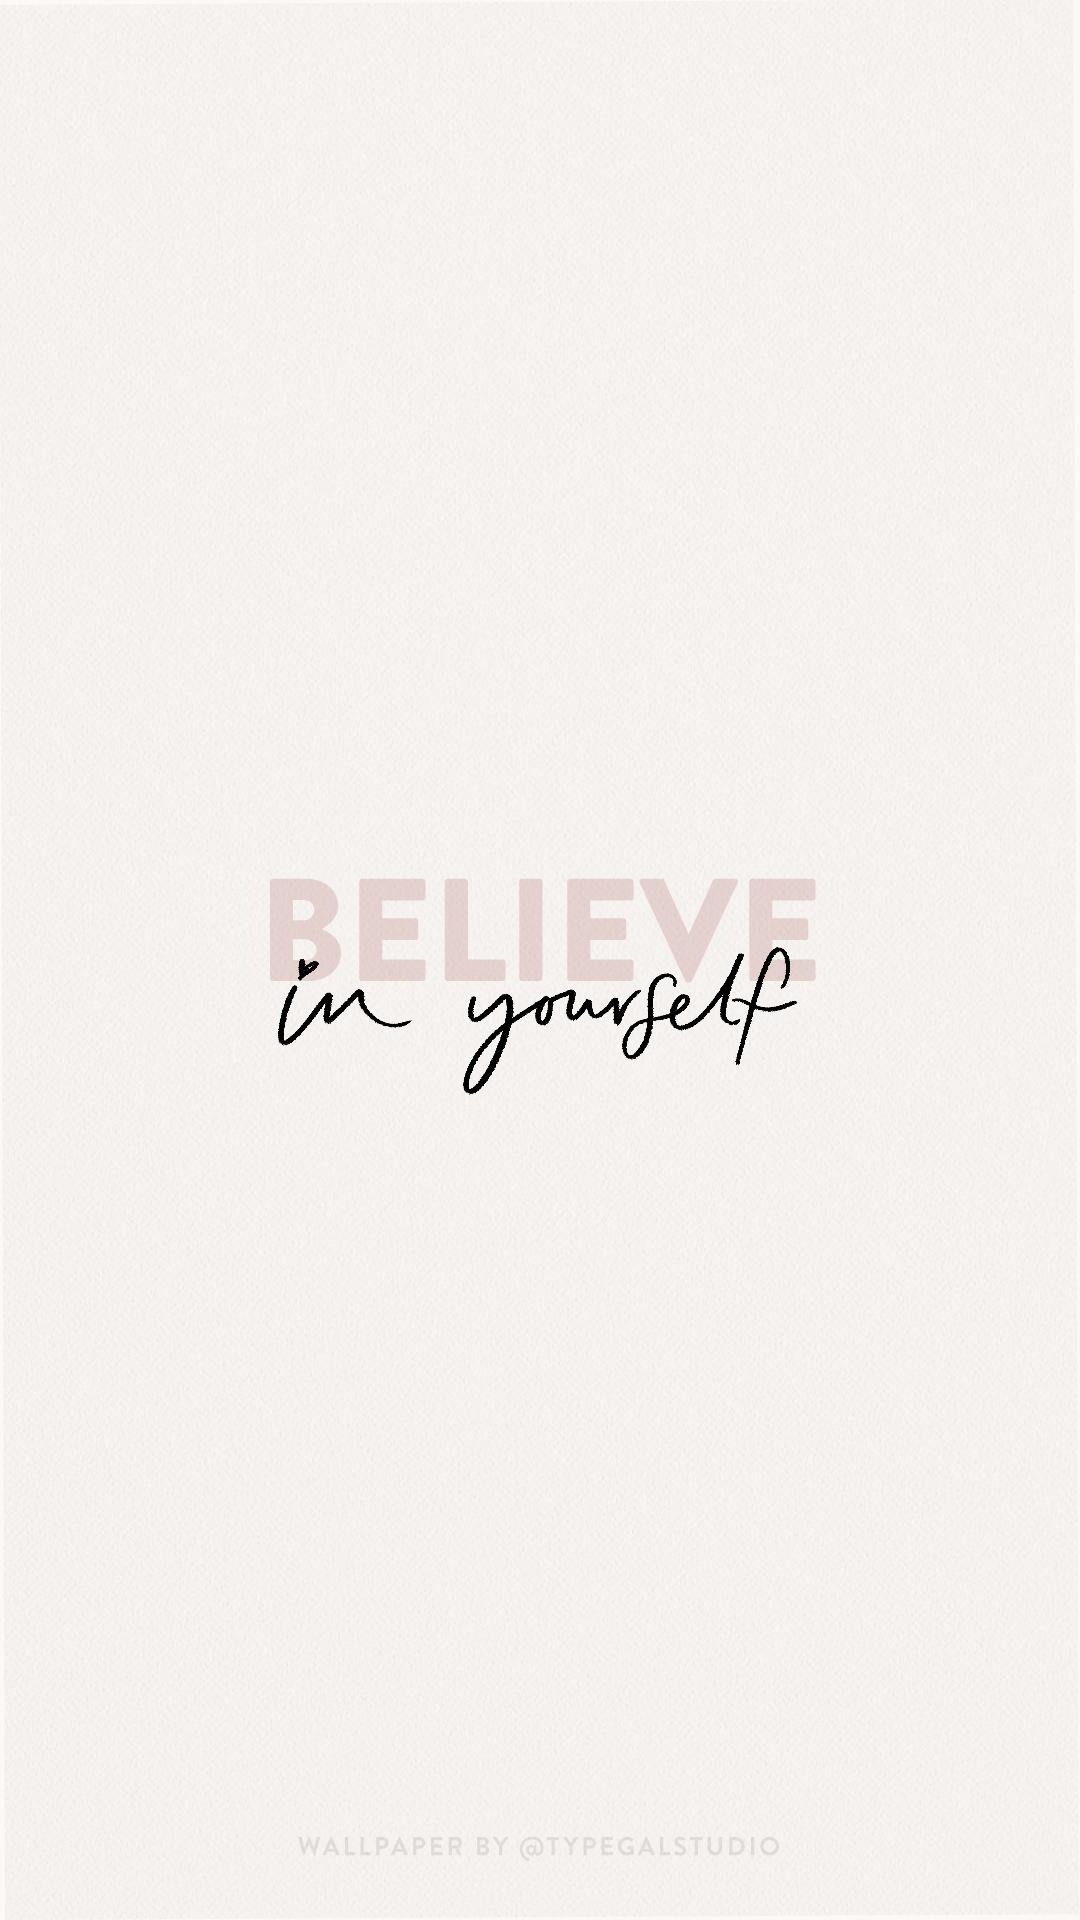 believe-in-yourself-wallpaper.png